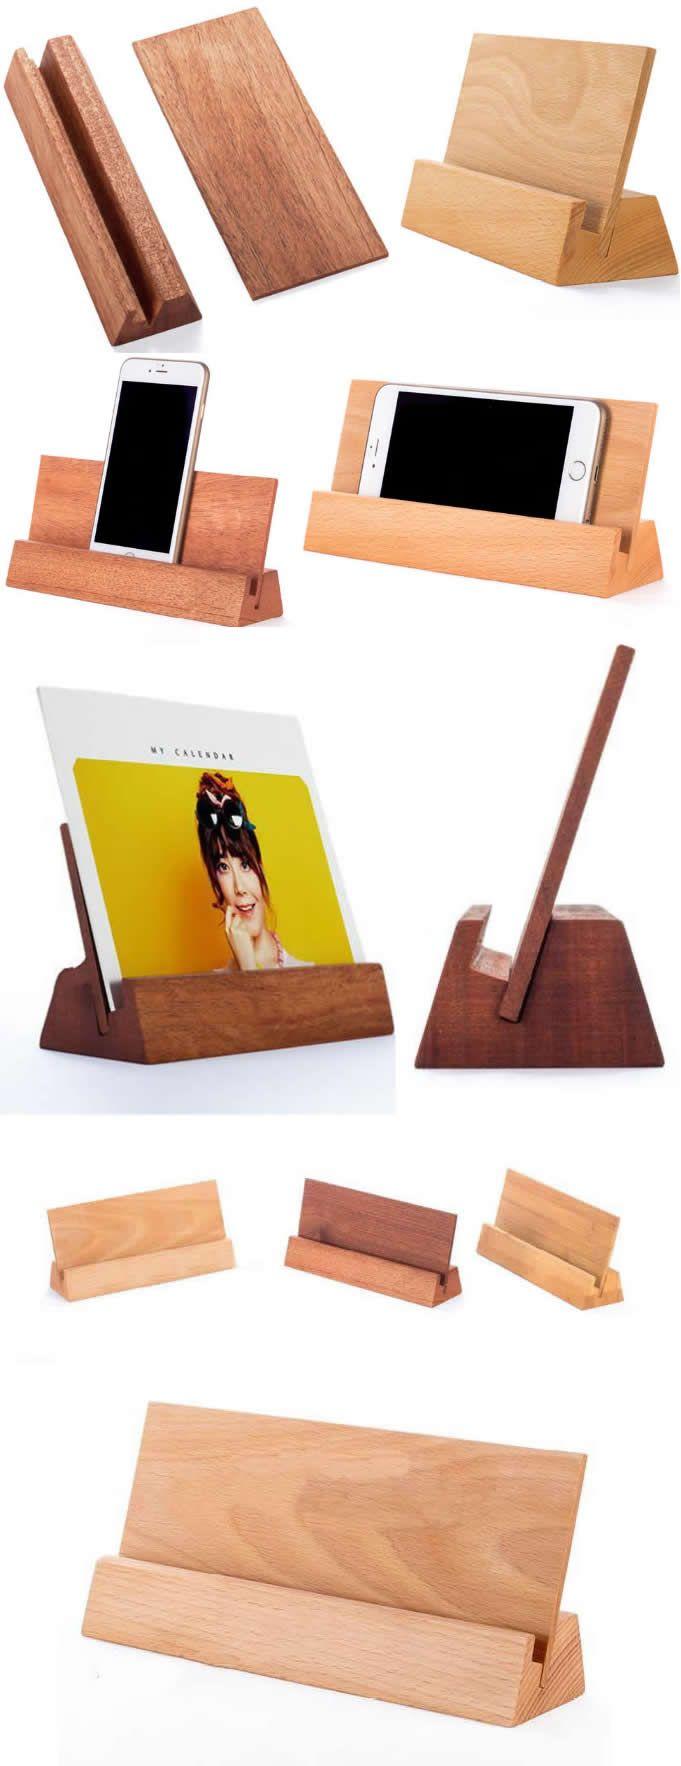 adjustable foldable desk iphone bracket holder ipad samsung phone item universal mobile stand for holders komytoo in cellphone tablet smartphone